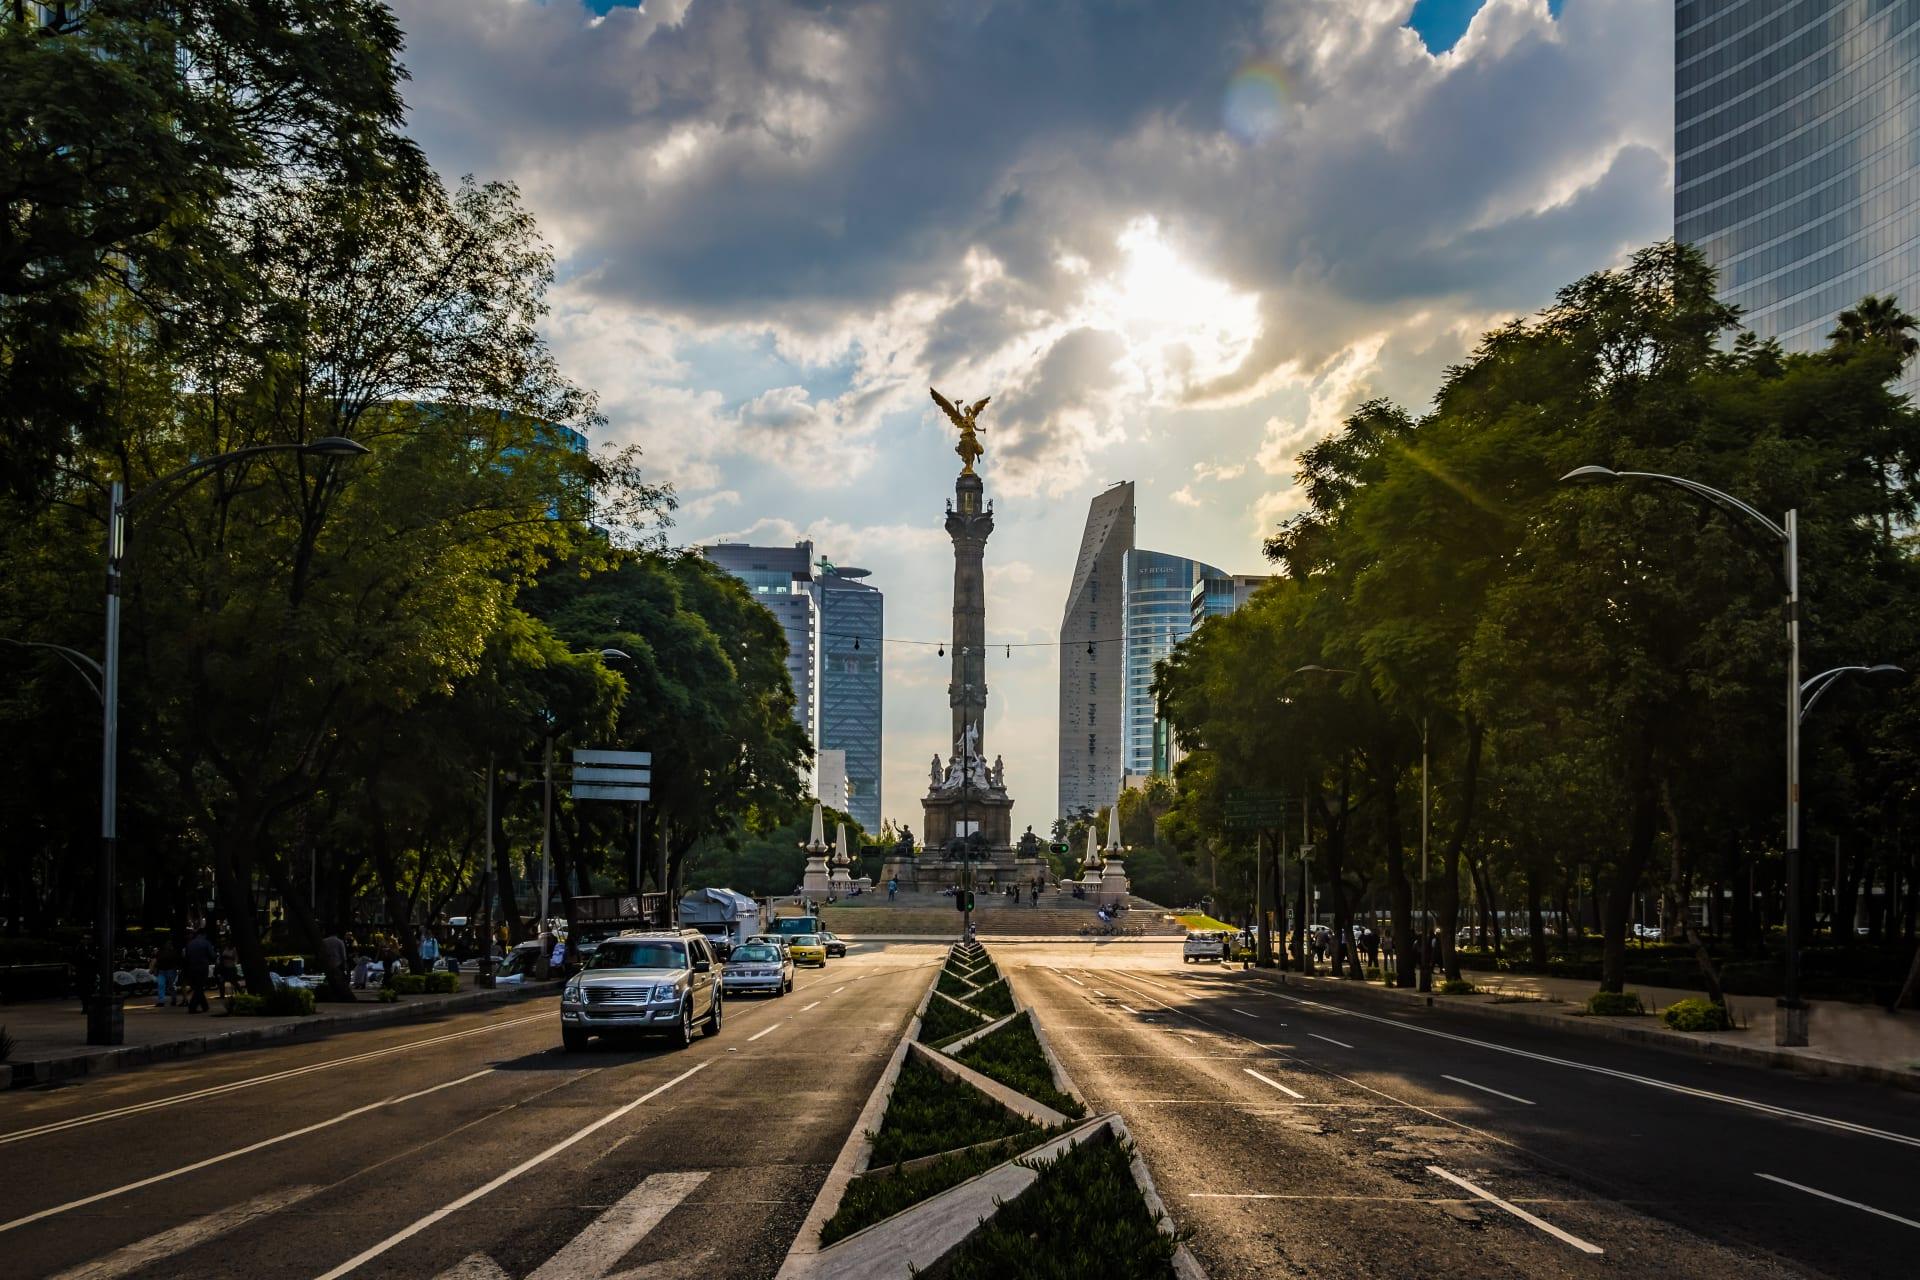 Mexico City - The iconic Paseo de la Reforma in Mexico City